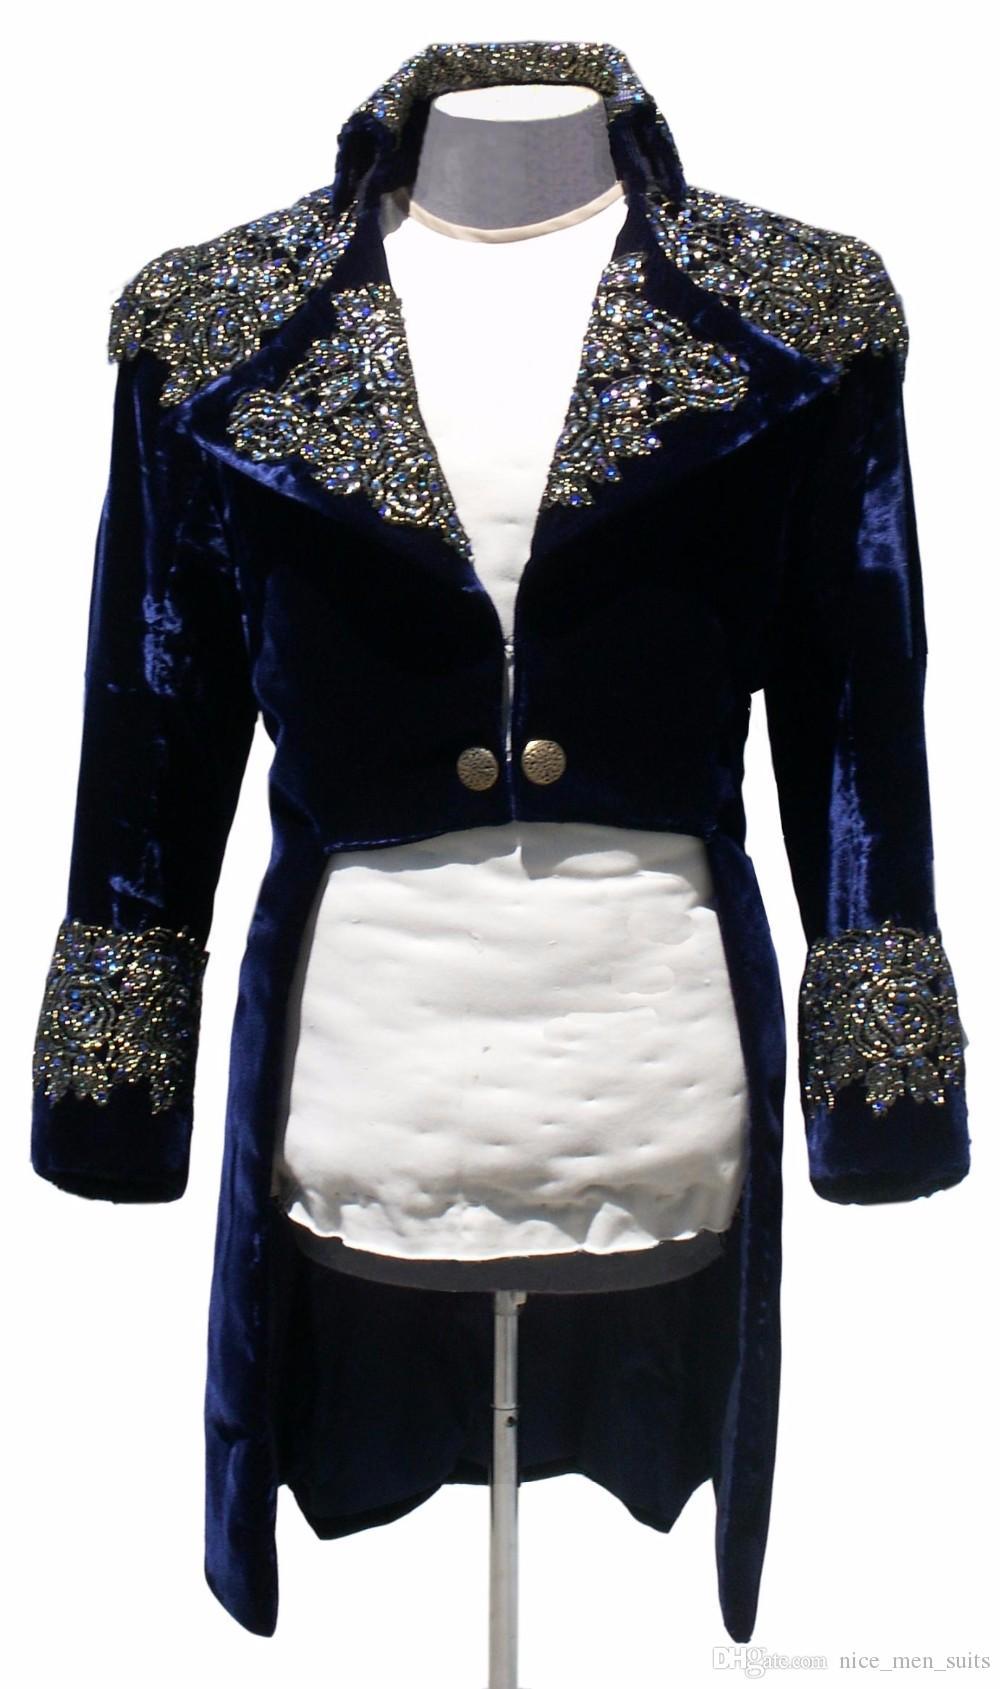 Men Suit Slim Fit 2019 Navy Blue Velvet Men suit With Applique Rhinestone For Singer Long Jacket Stage Performance 1 piece